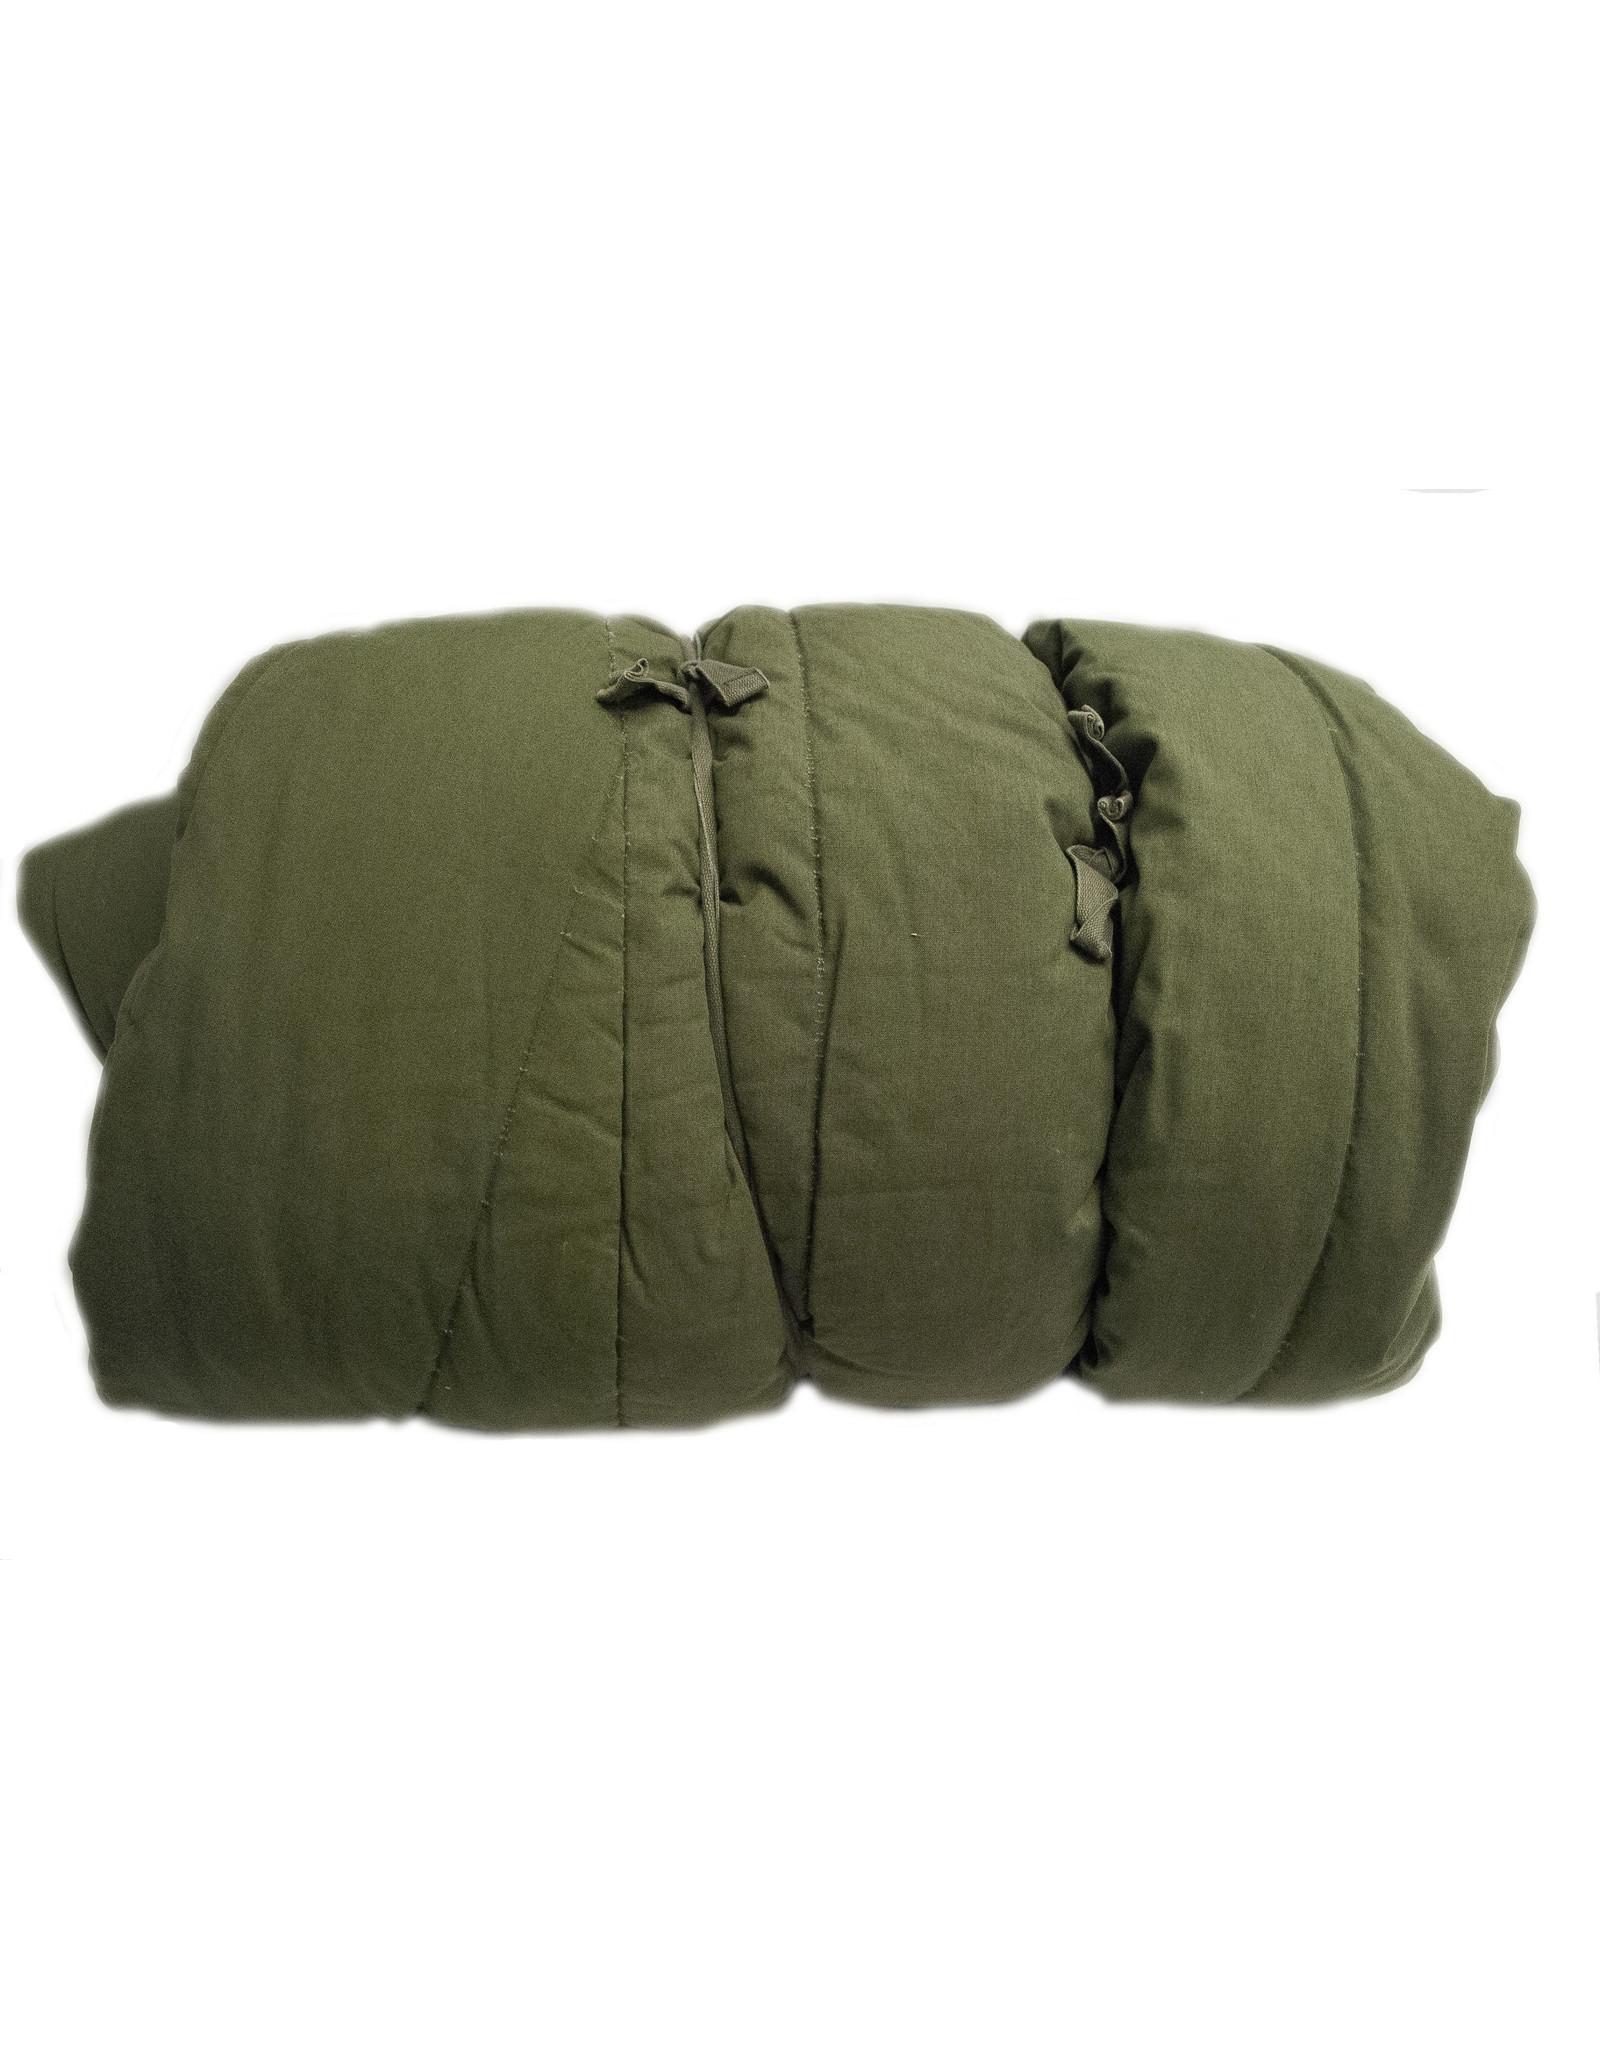 USED Extra Cold Sleeping Bag OD